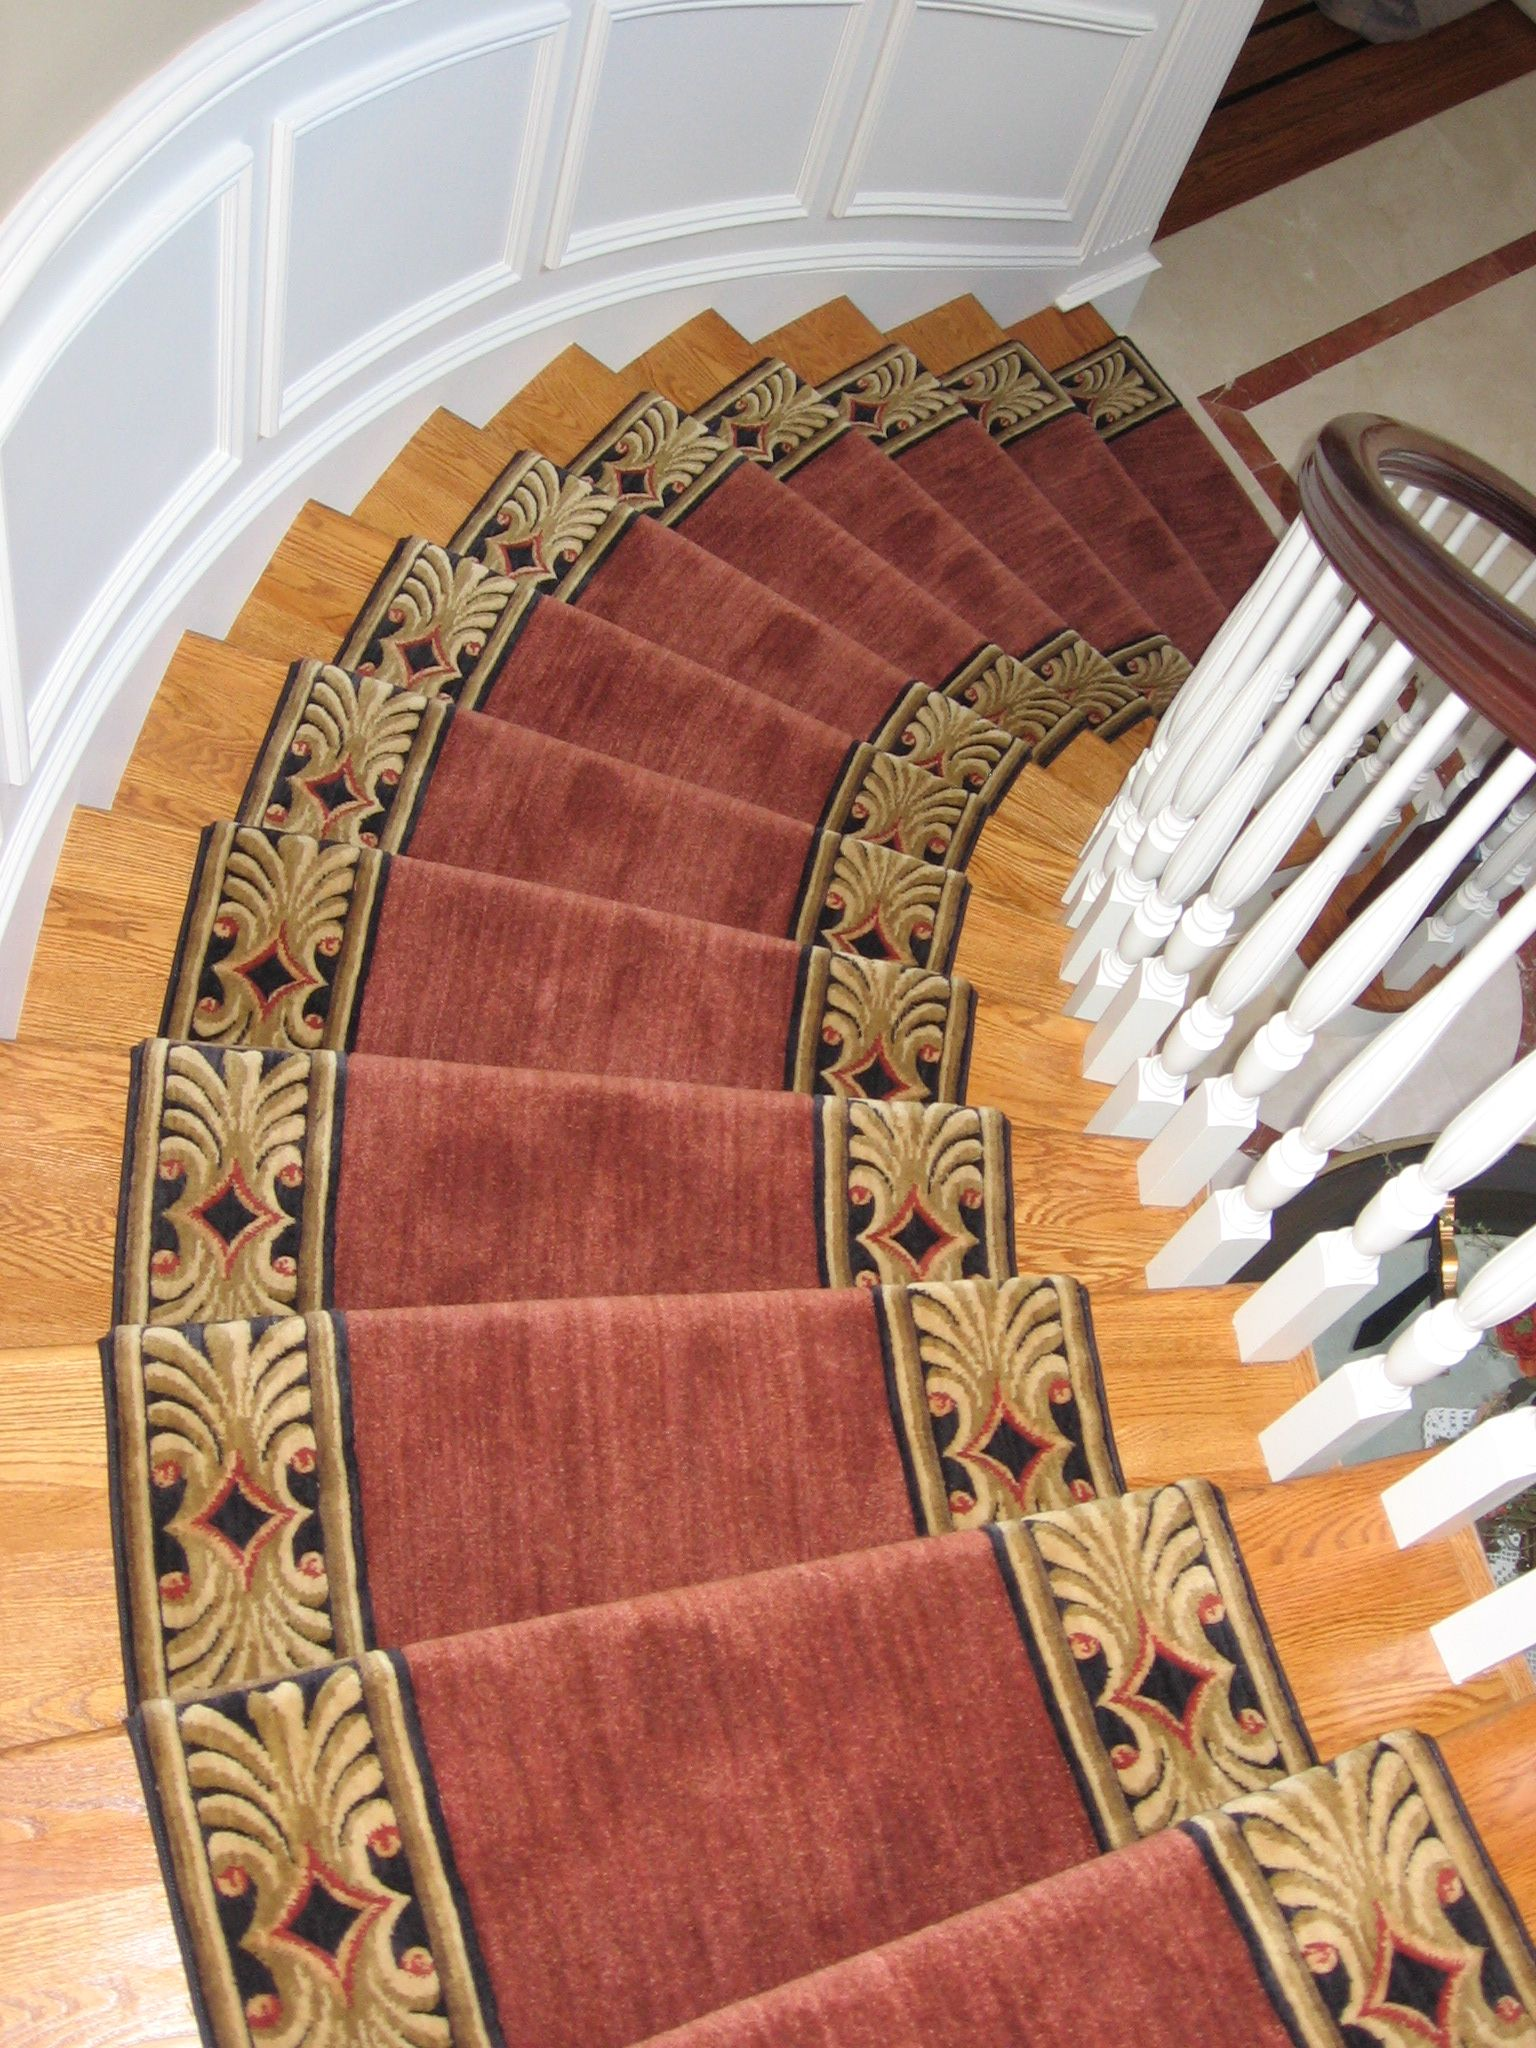 Charmant Custom Made Stair Runner By G. Fried Carpet U0026 Design, Paramus NJ